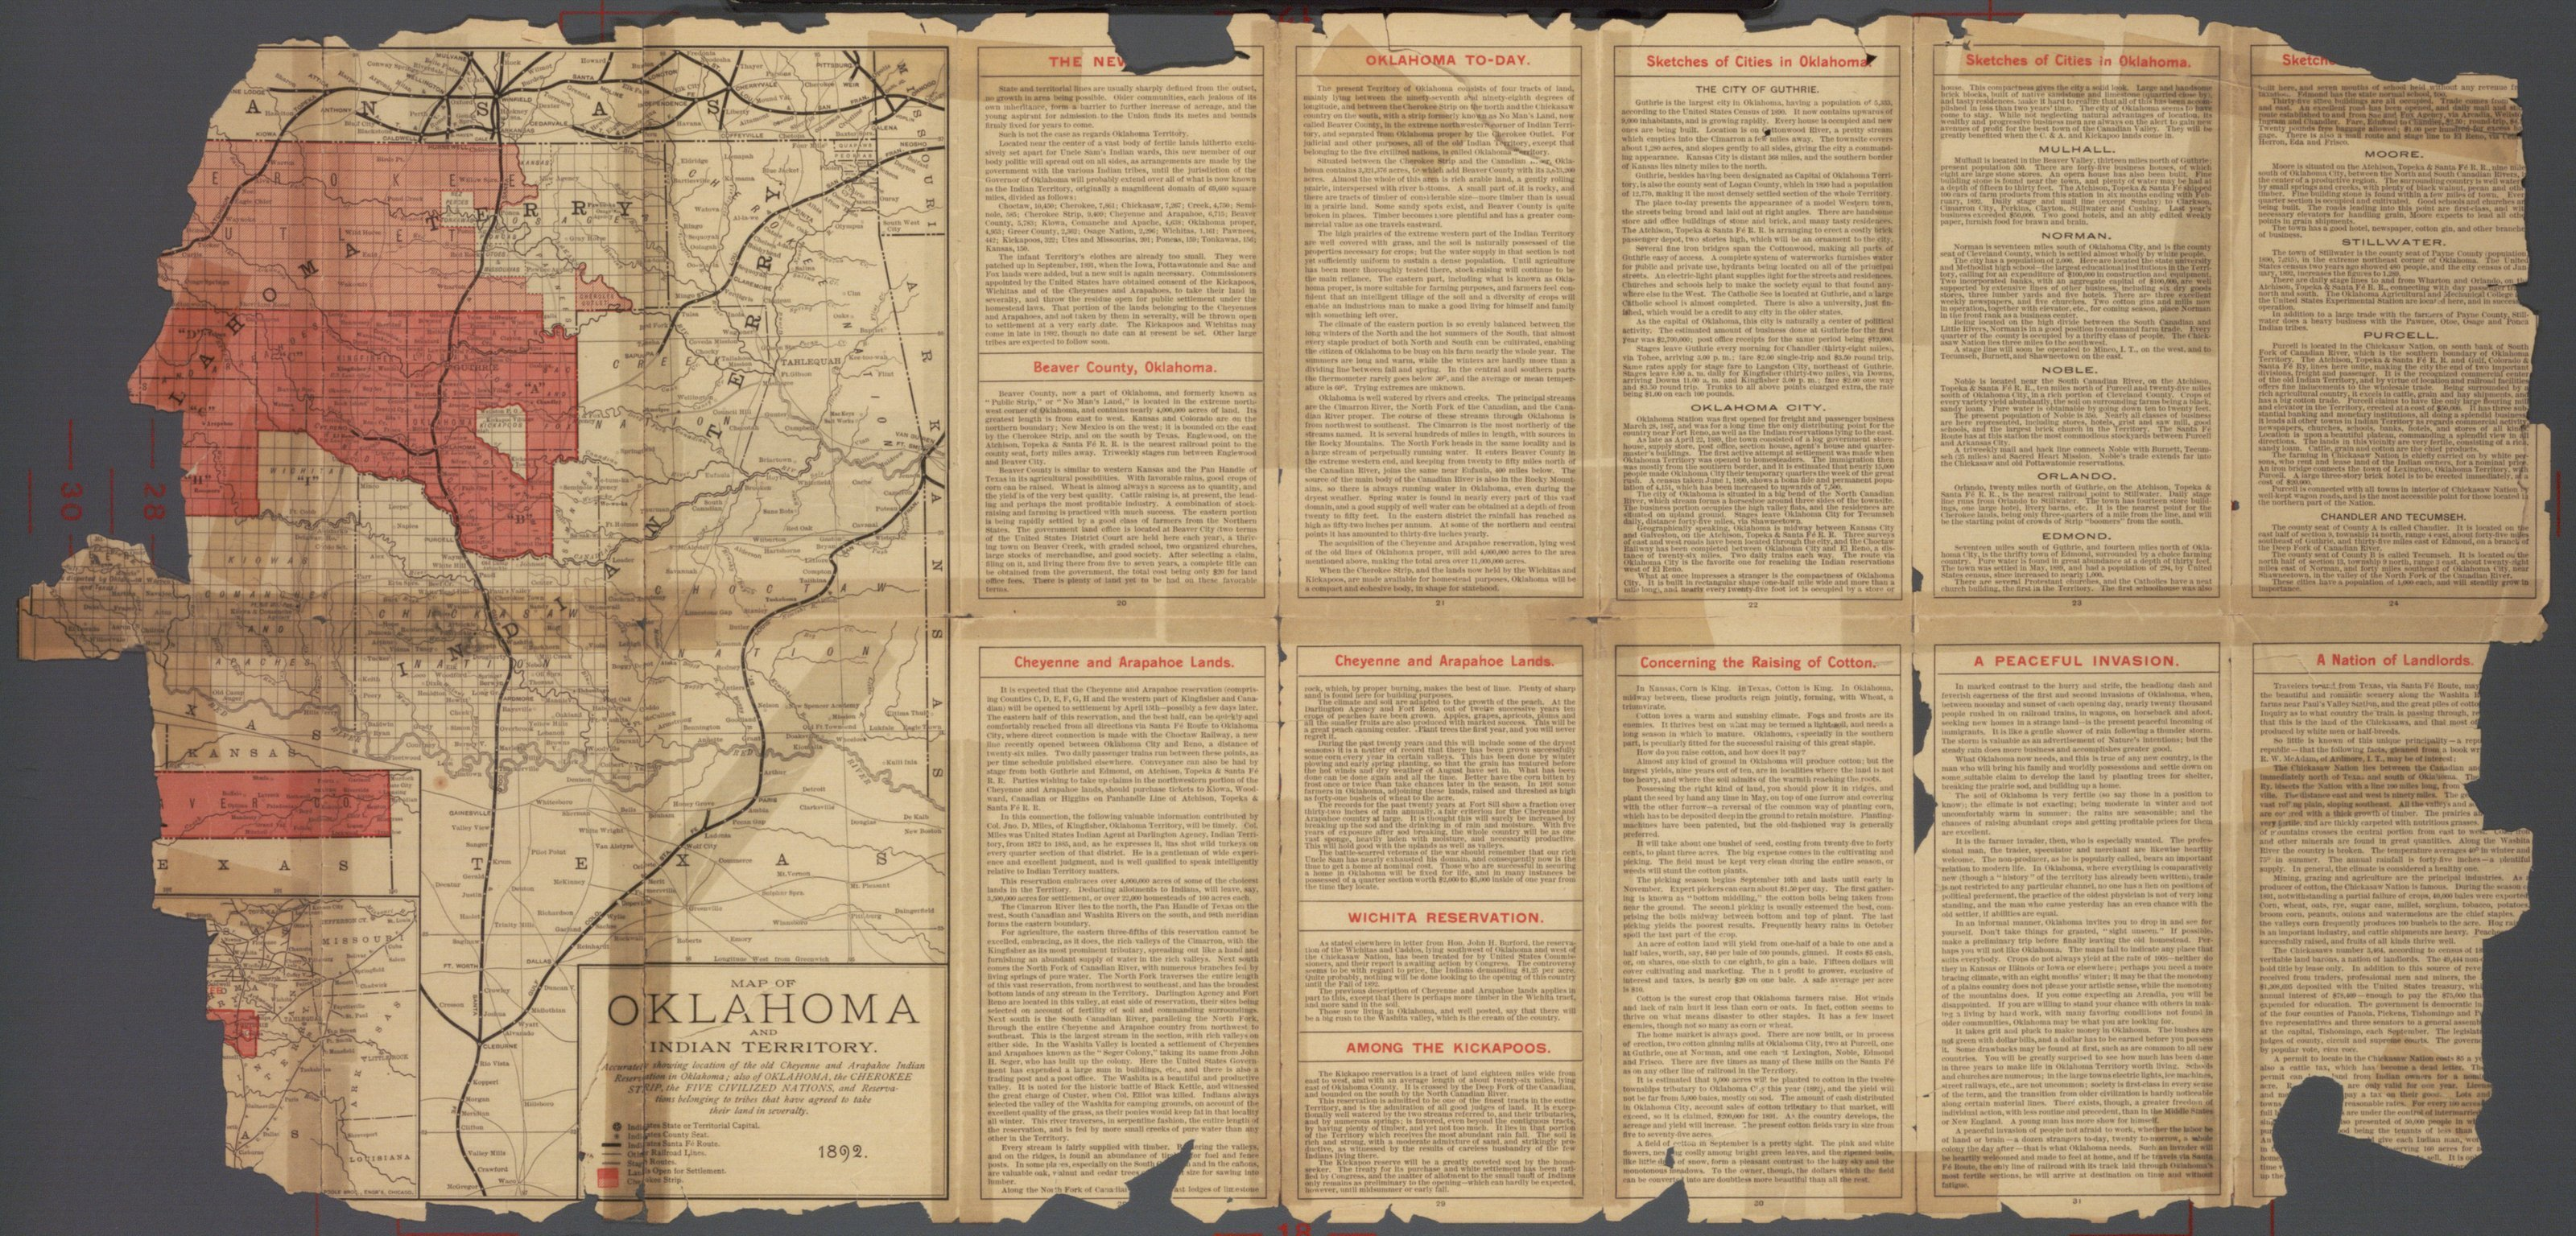 Beautiful Oklahoma and Indian Territory - 1